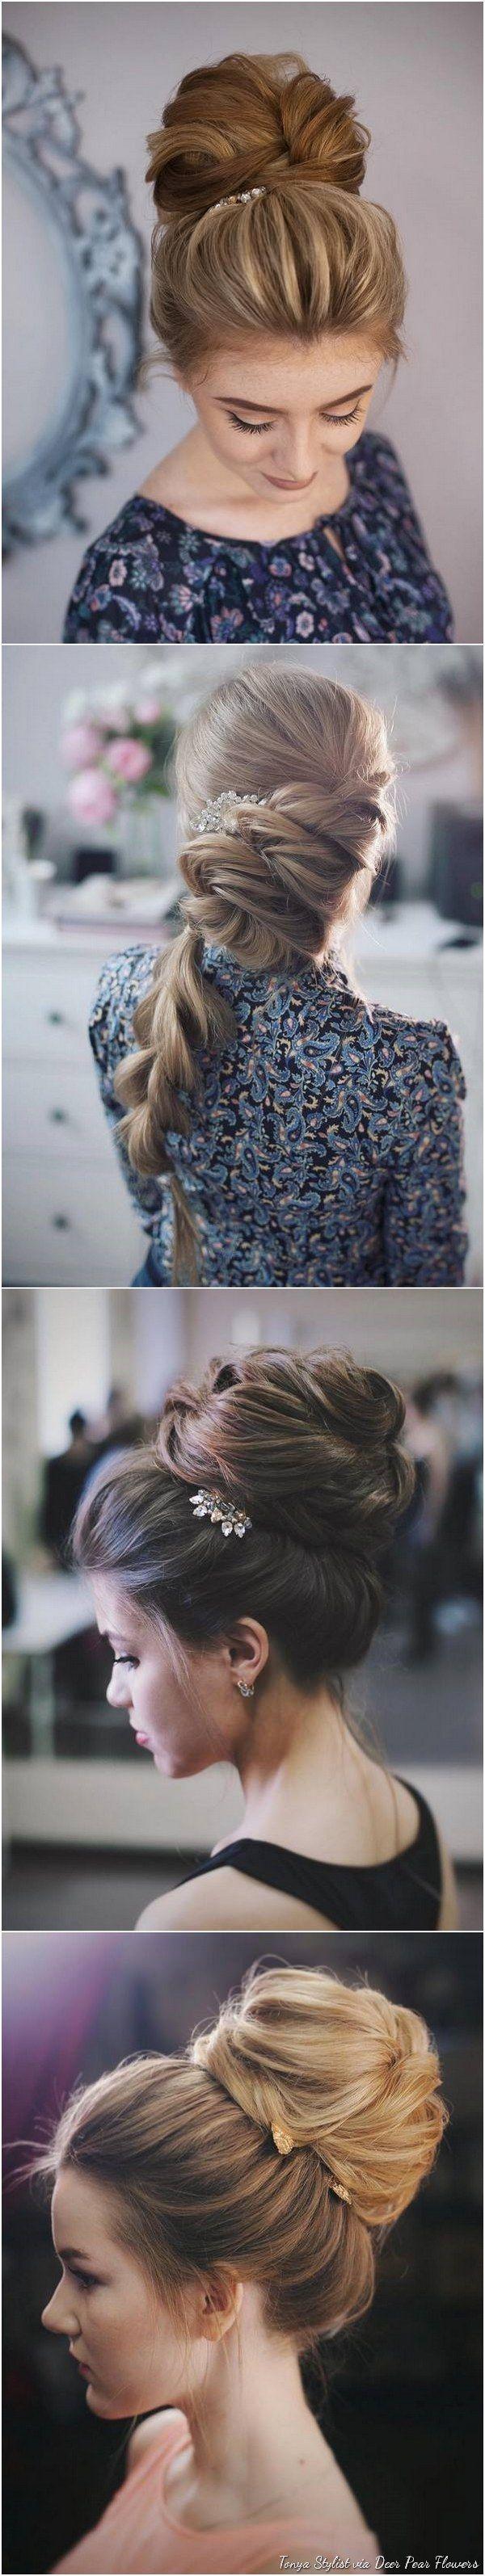 best tranças ud braids images on pinterest hairstyle ideas cute